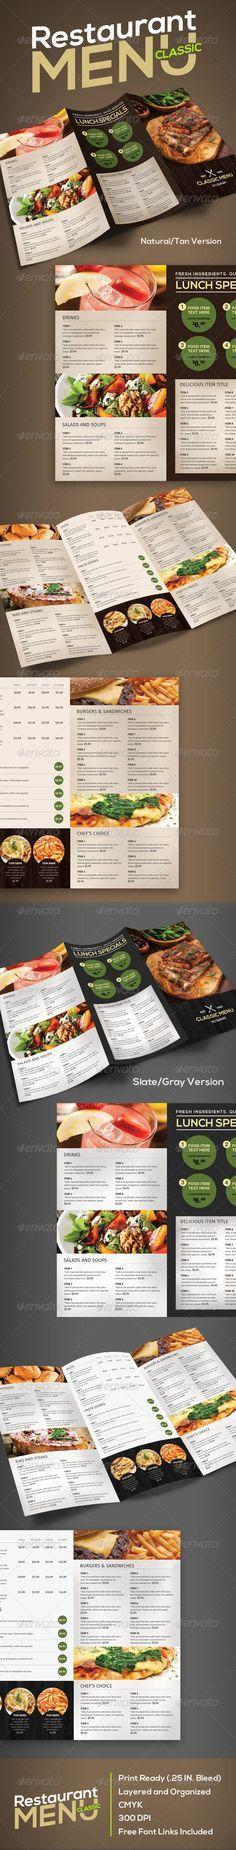 Restaurant Menu (Classic) Template #design #speisekarte Download: http://graphicriver.net/item/restaurant-menu-classic/7503885?ref=ksioks